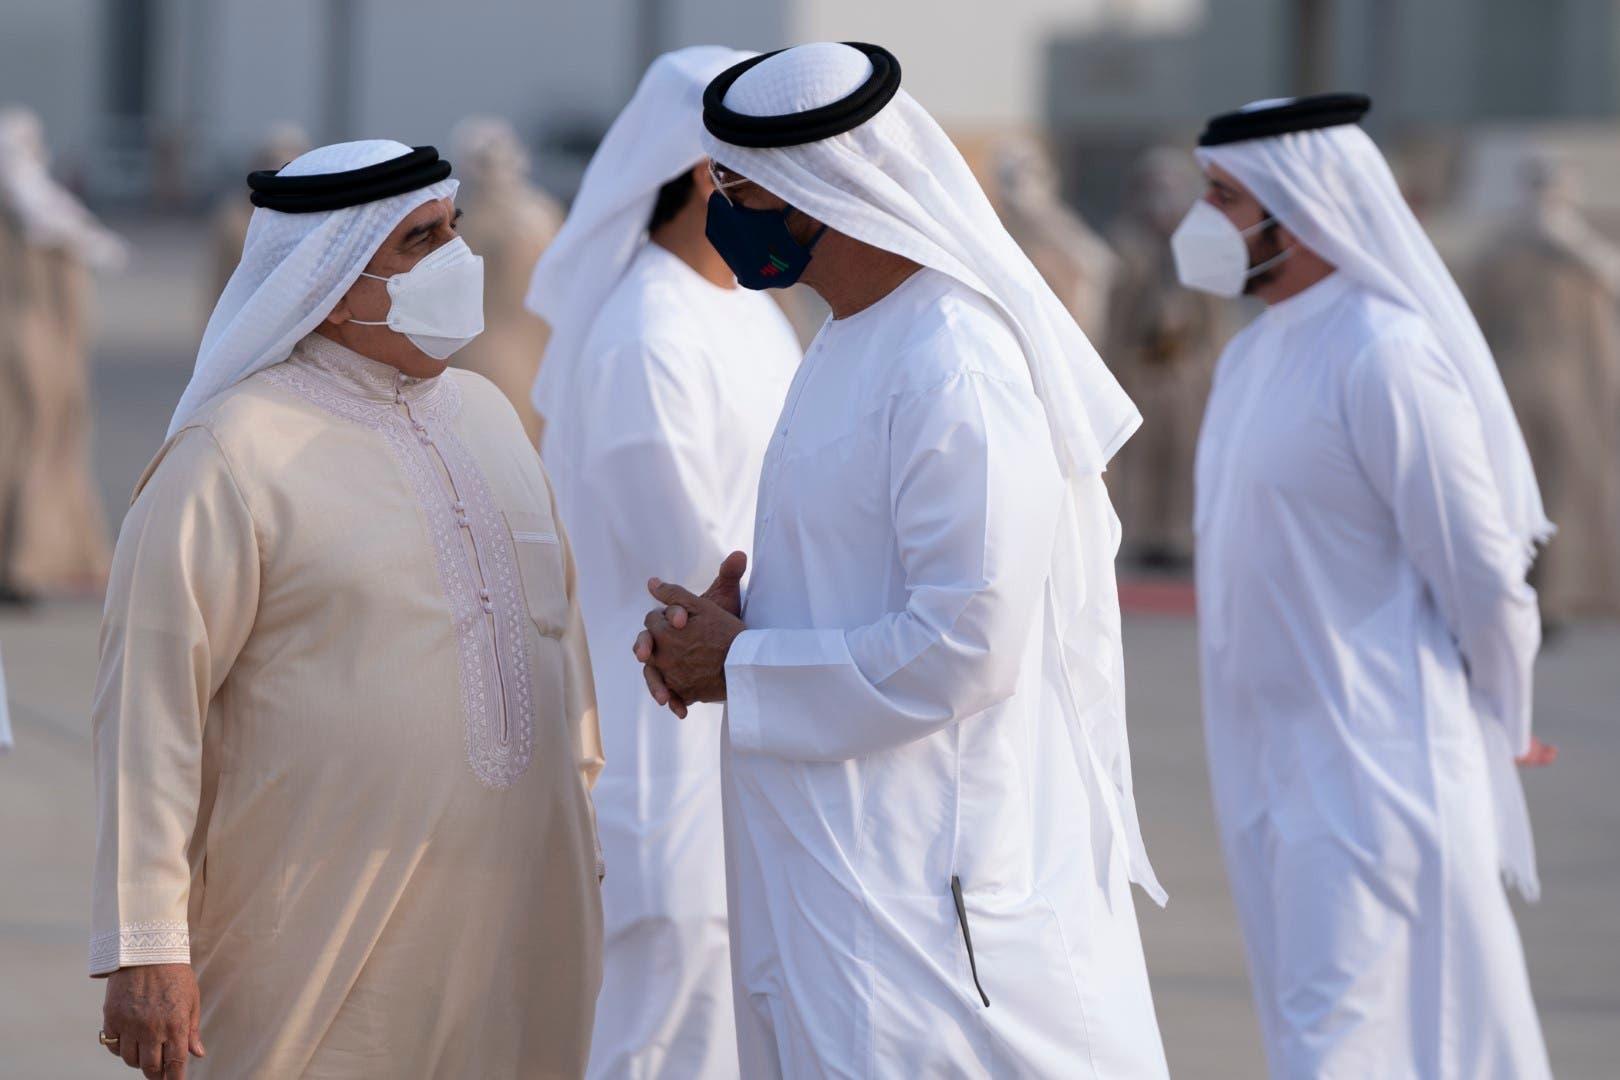 Bahrain's King Hamad bin Isa Al Khalifa arrives in Abu Dhabi, left, to meet Abu Dhabi Crown Prince Sheikh Mohamed bin Zayed Al Nahyan, right. (WAM)